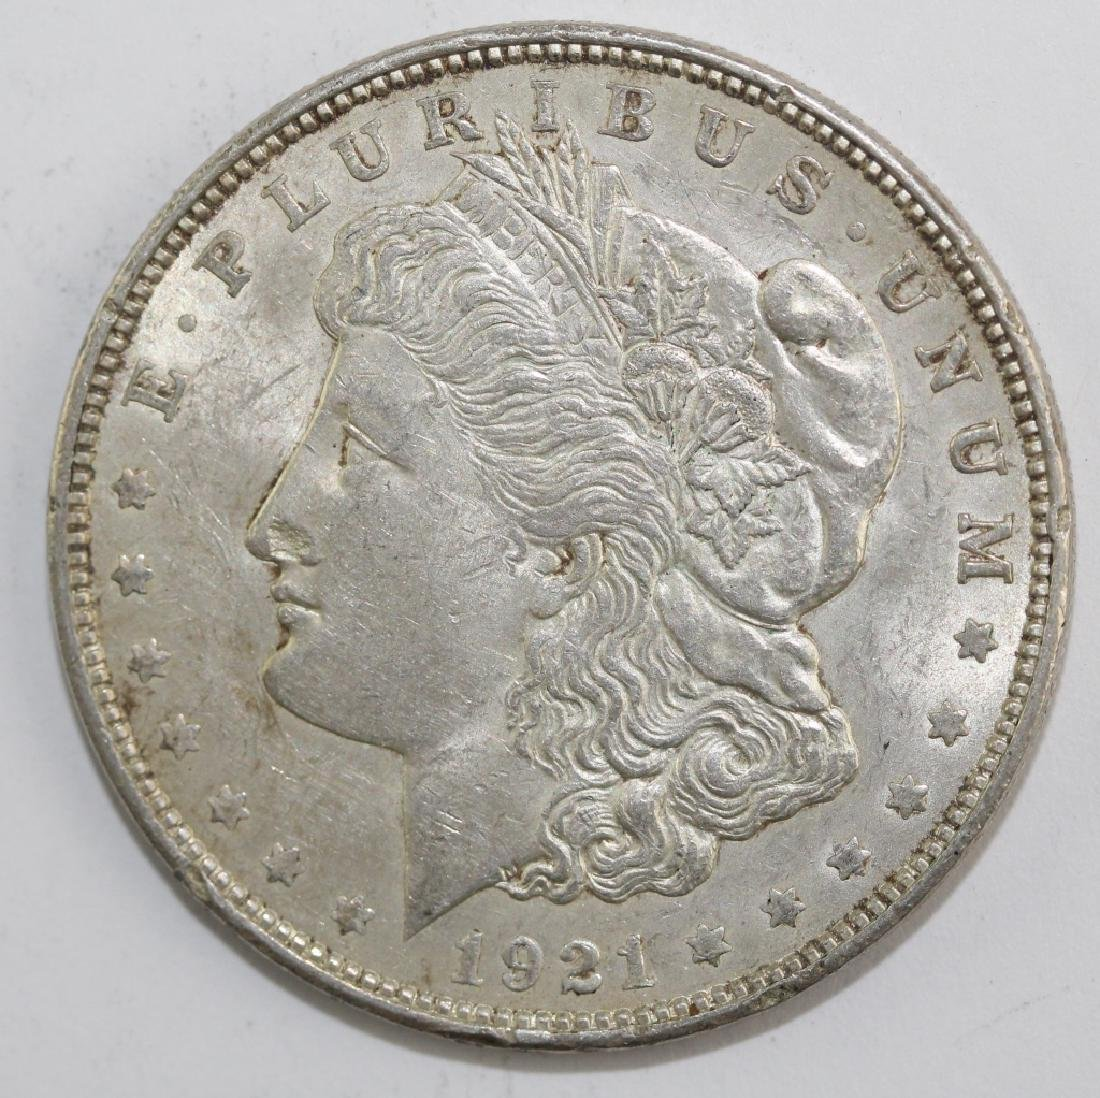 Lot 5 Morgan Silver $1 Dollars United States Coins - 7